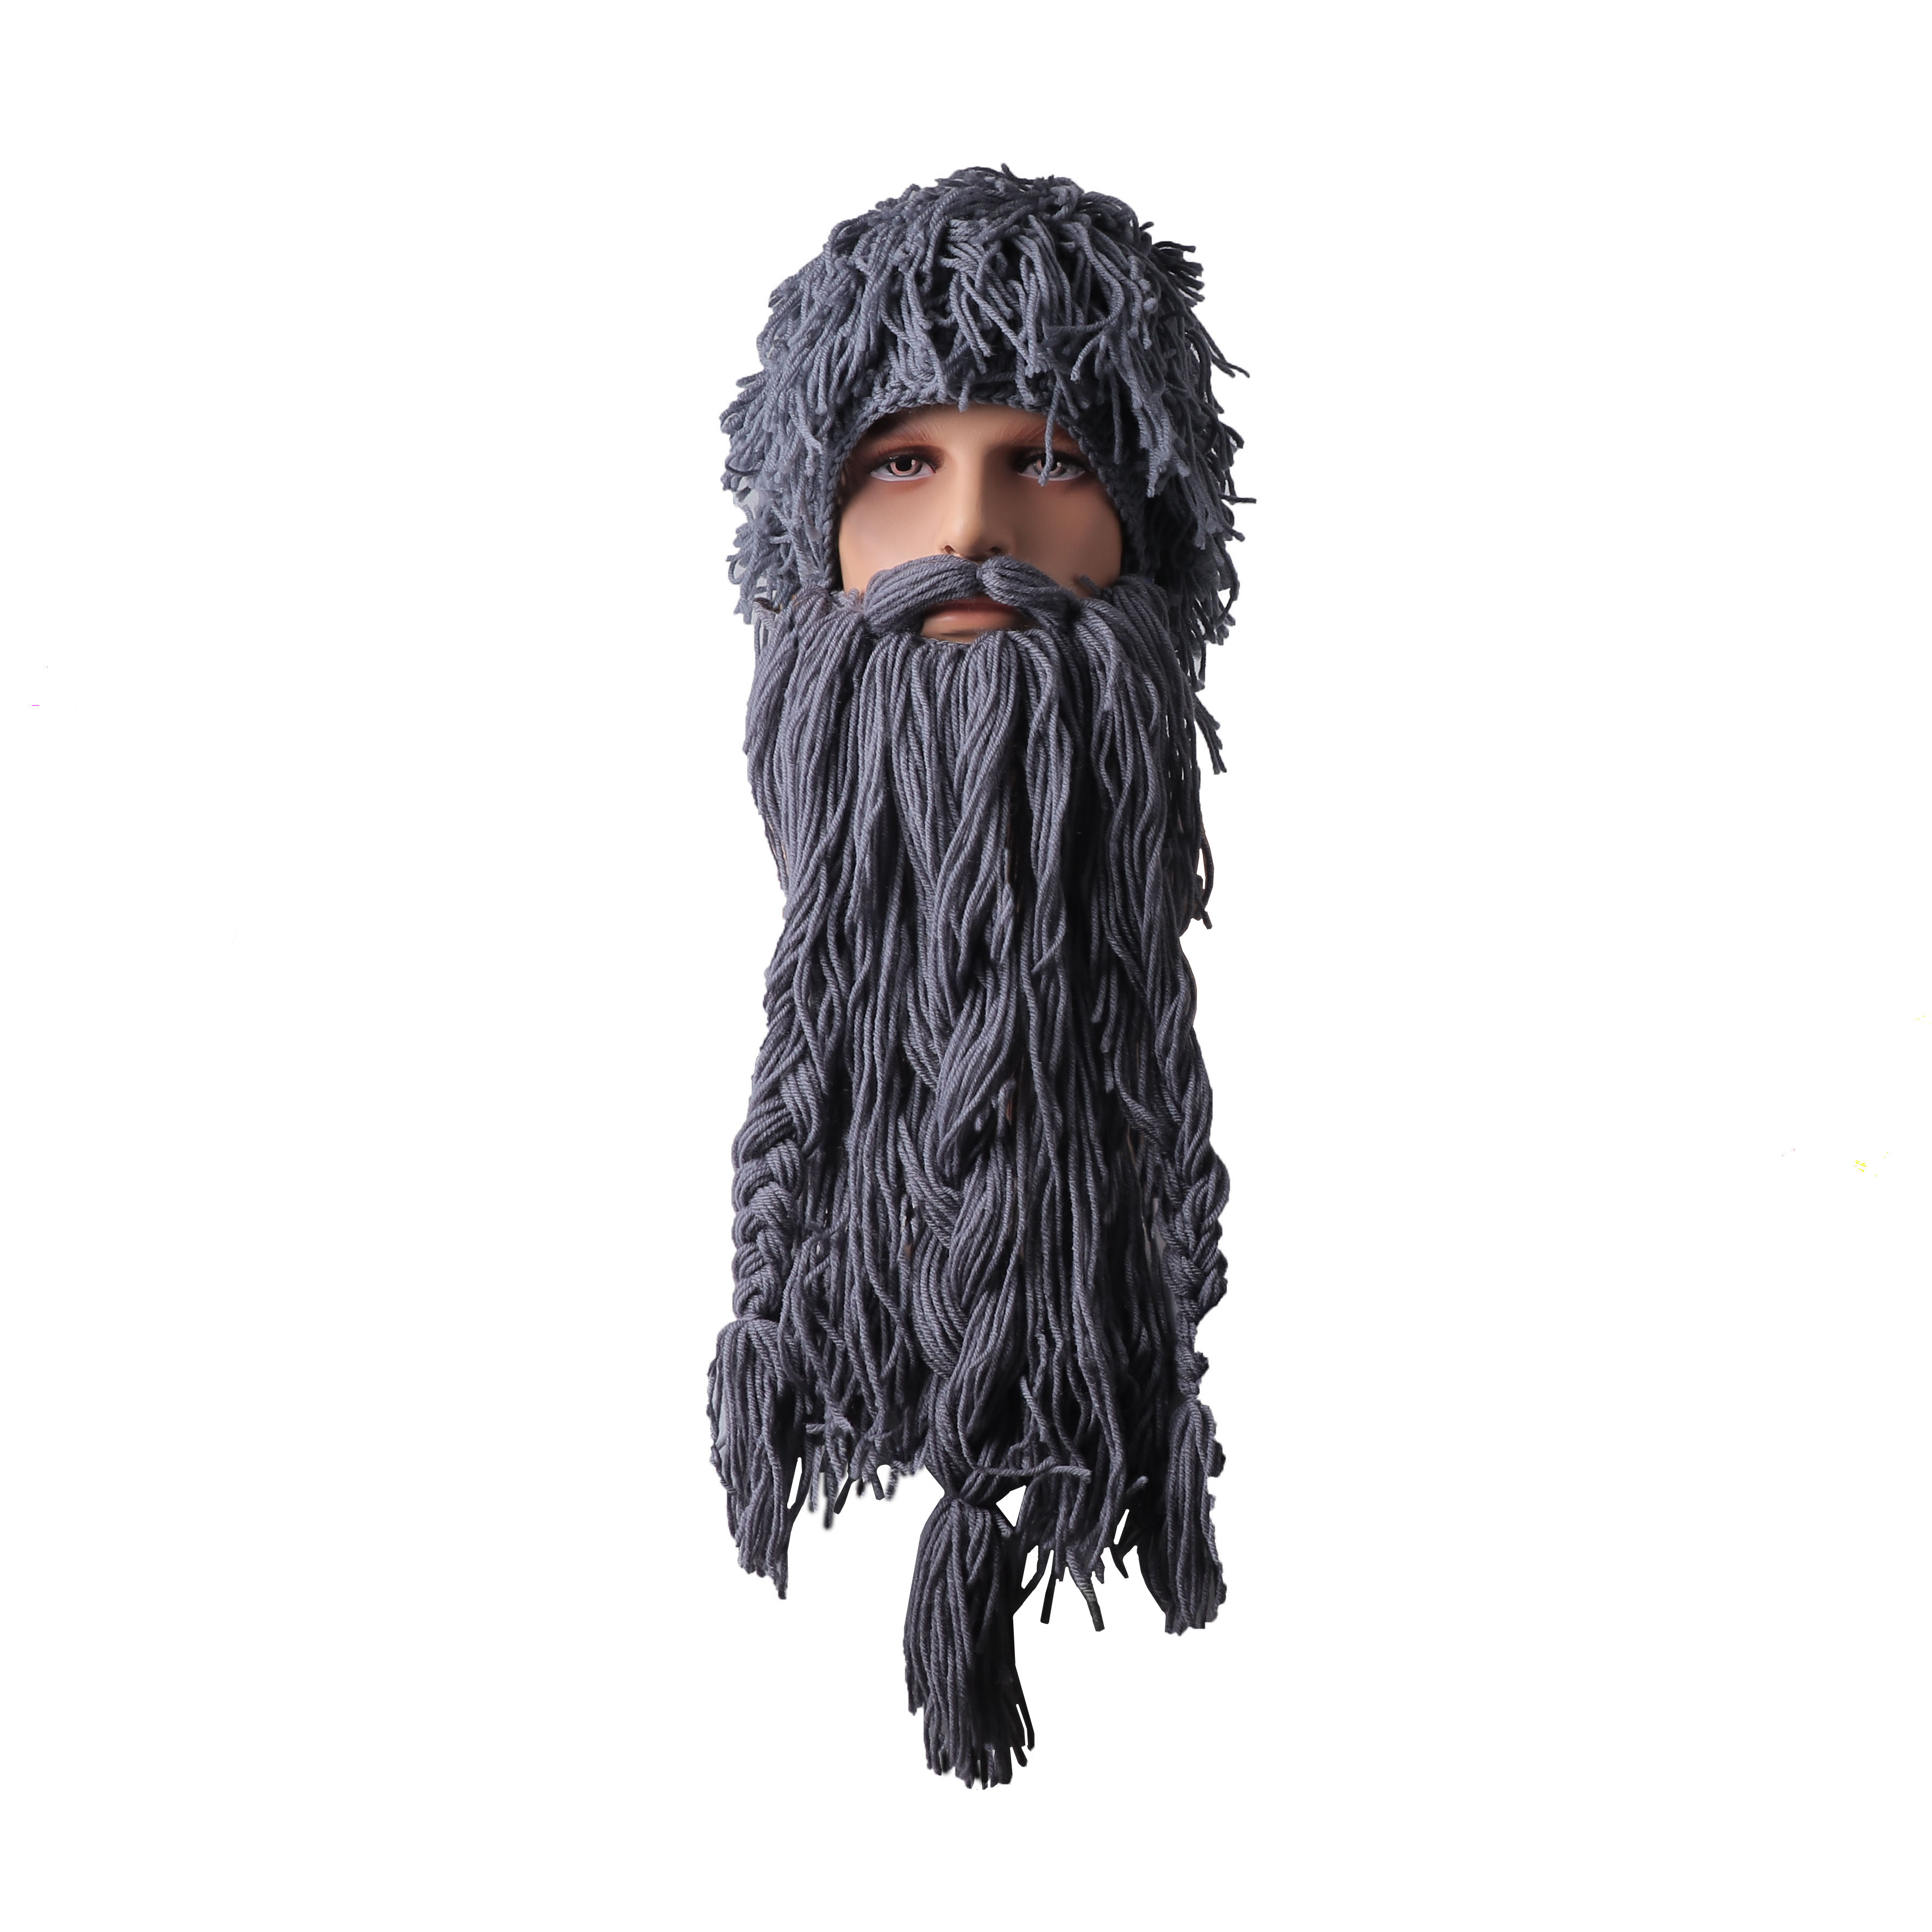 Top SaleπWinter Hats Wig Beard-Hat Christmas-Mask Viking Cosplay Funny Vagabond Men's Cap Knitted